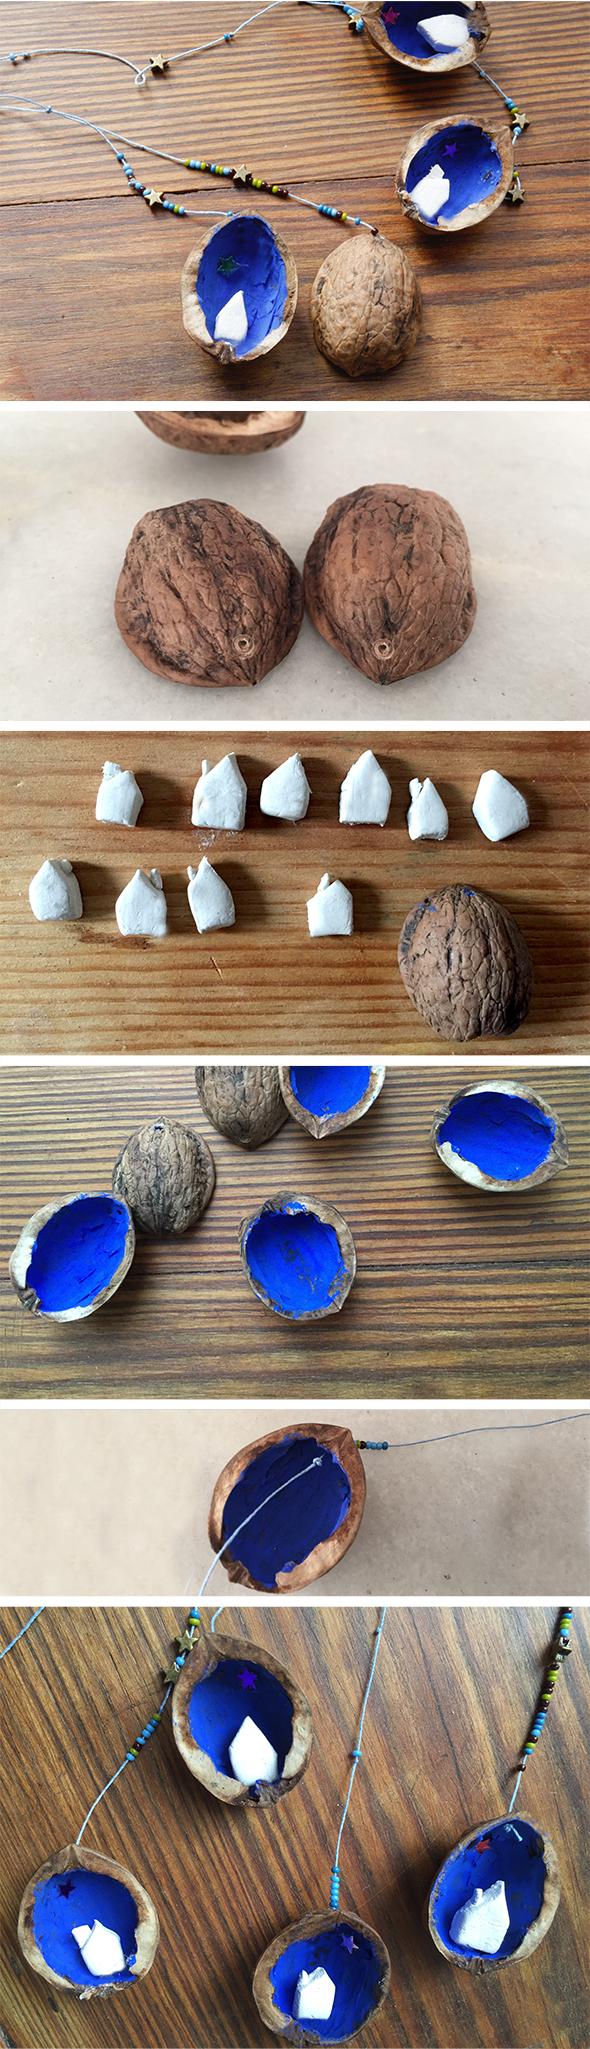 anhänger colgante penadant casa house haus manualidad craft basteln nuss nuez nut